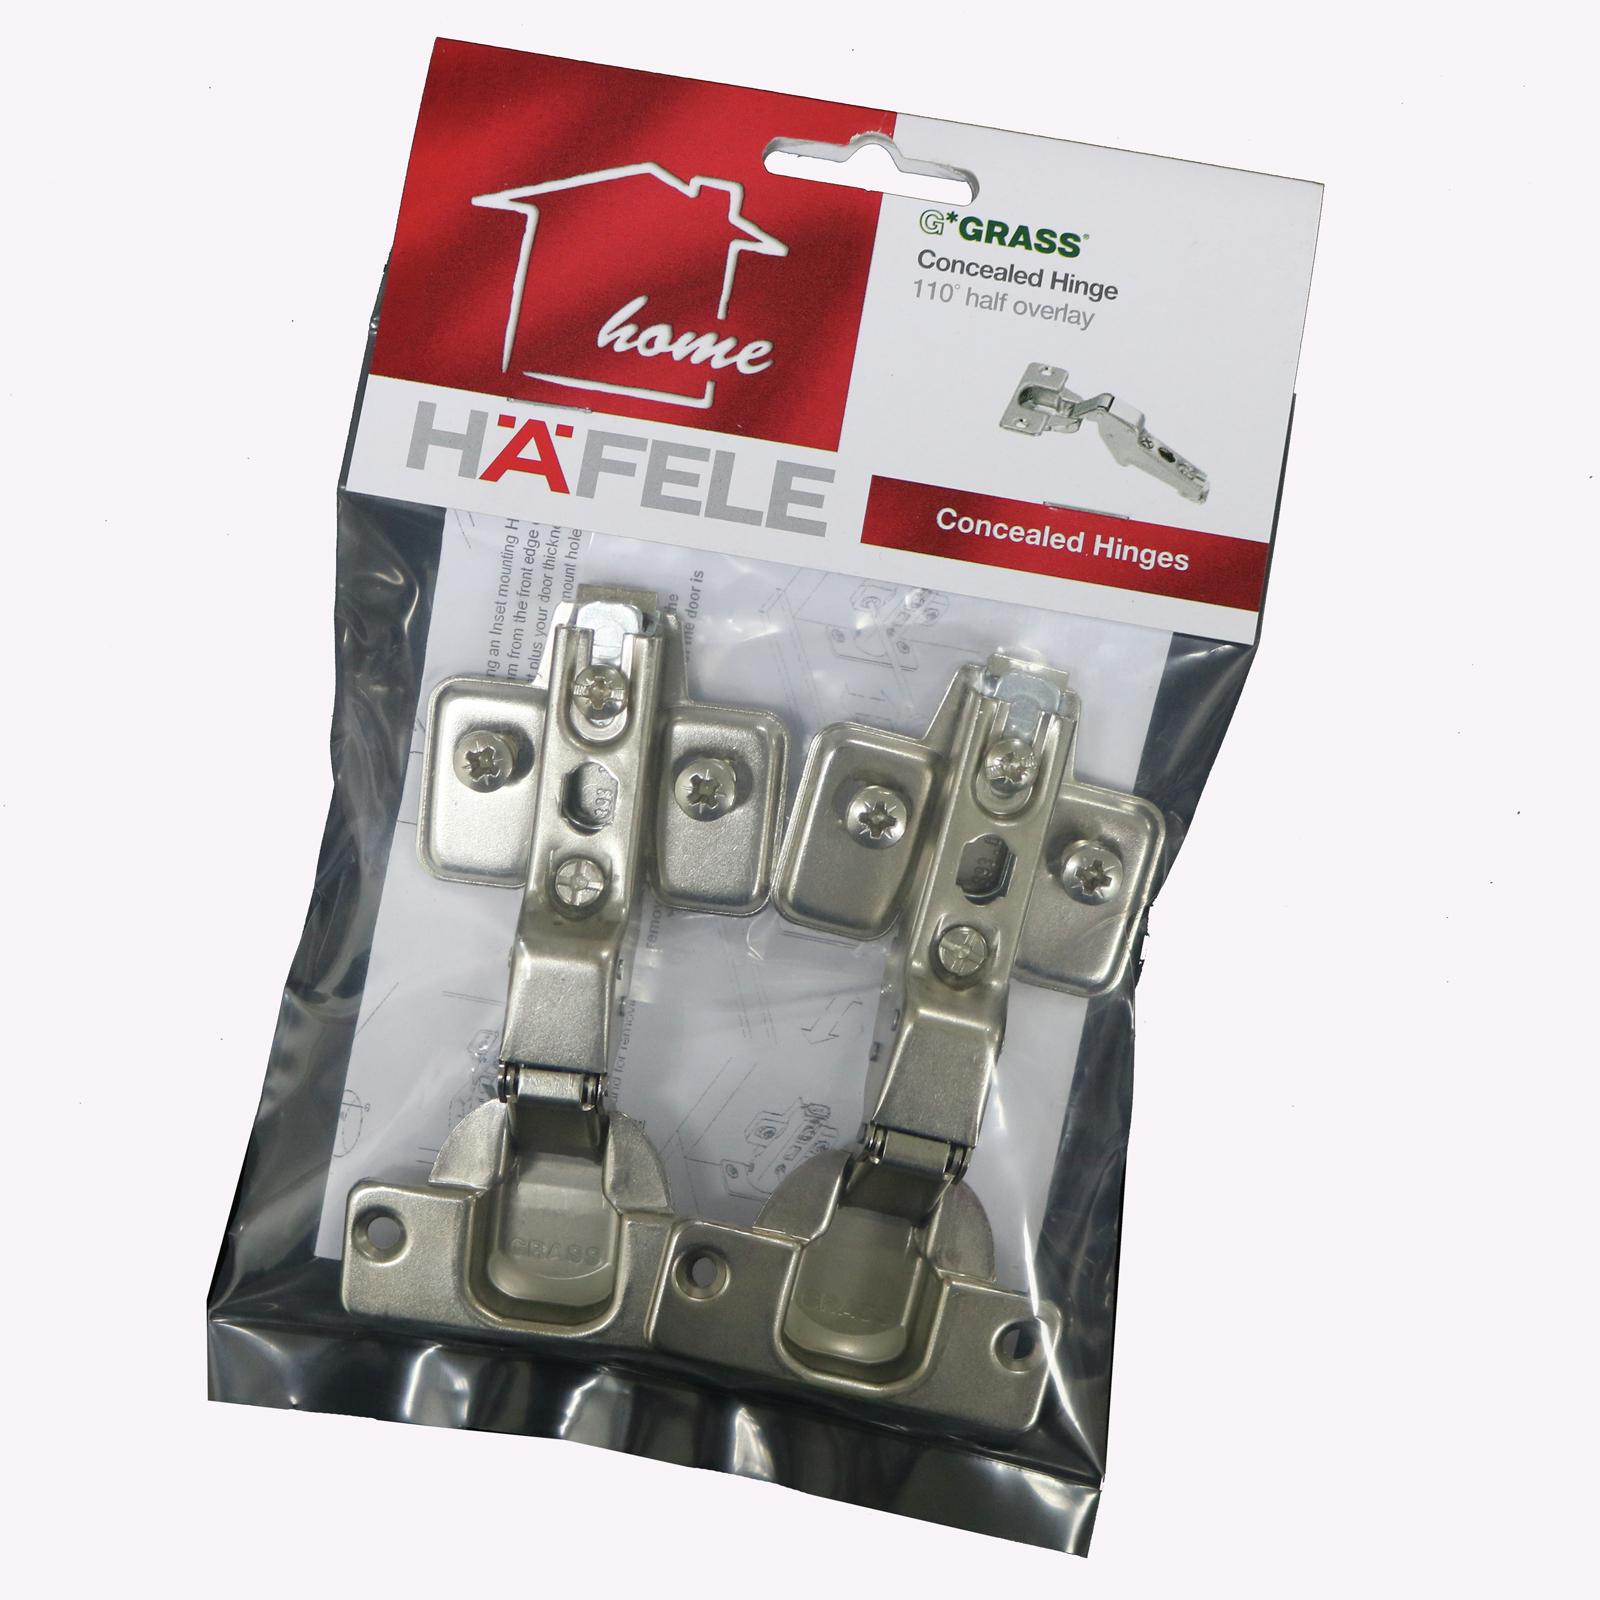 Hafele Grass 110º Half Overlay Hinge - 2 Pack